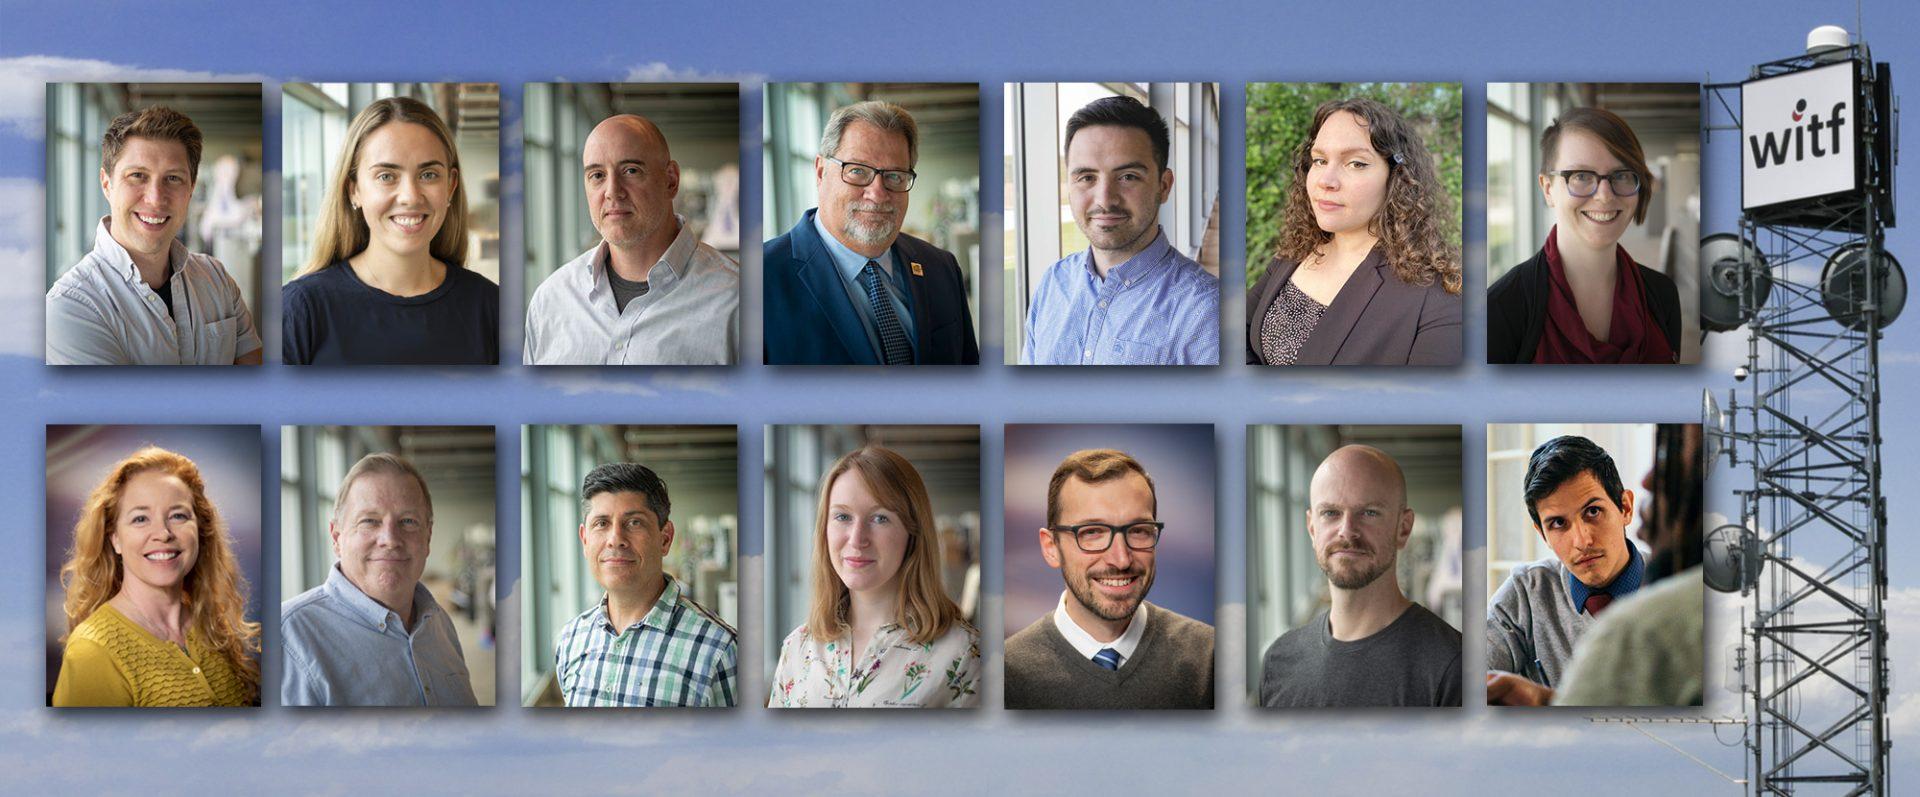 WITF's News Team